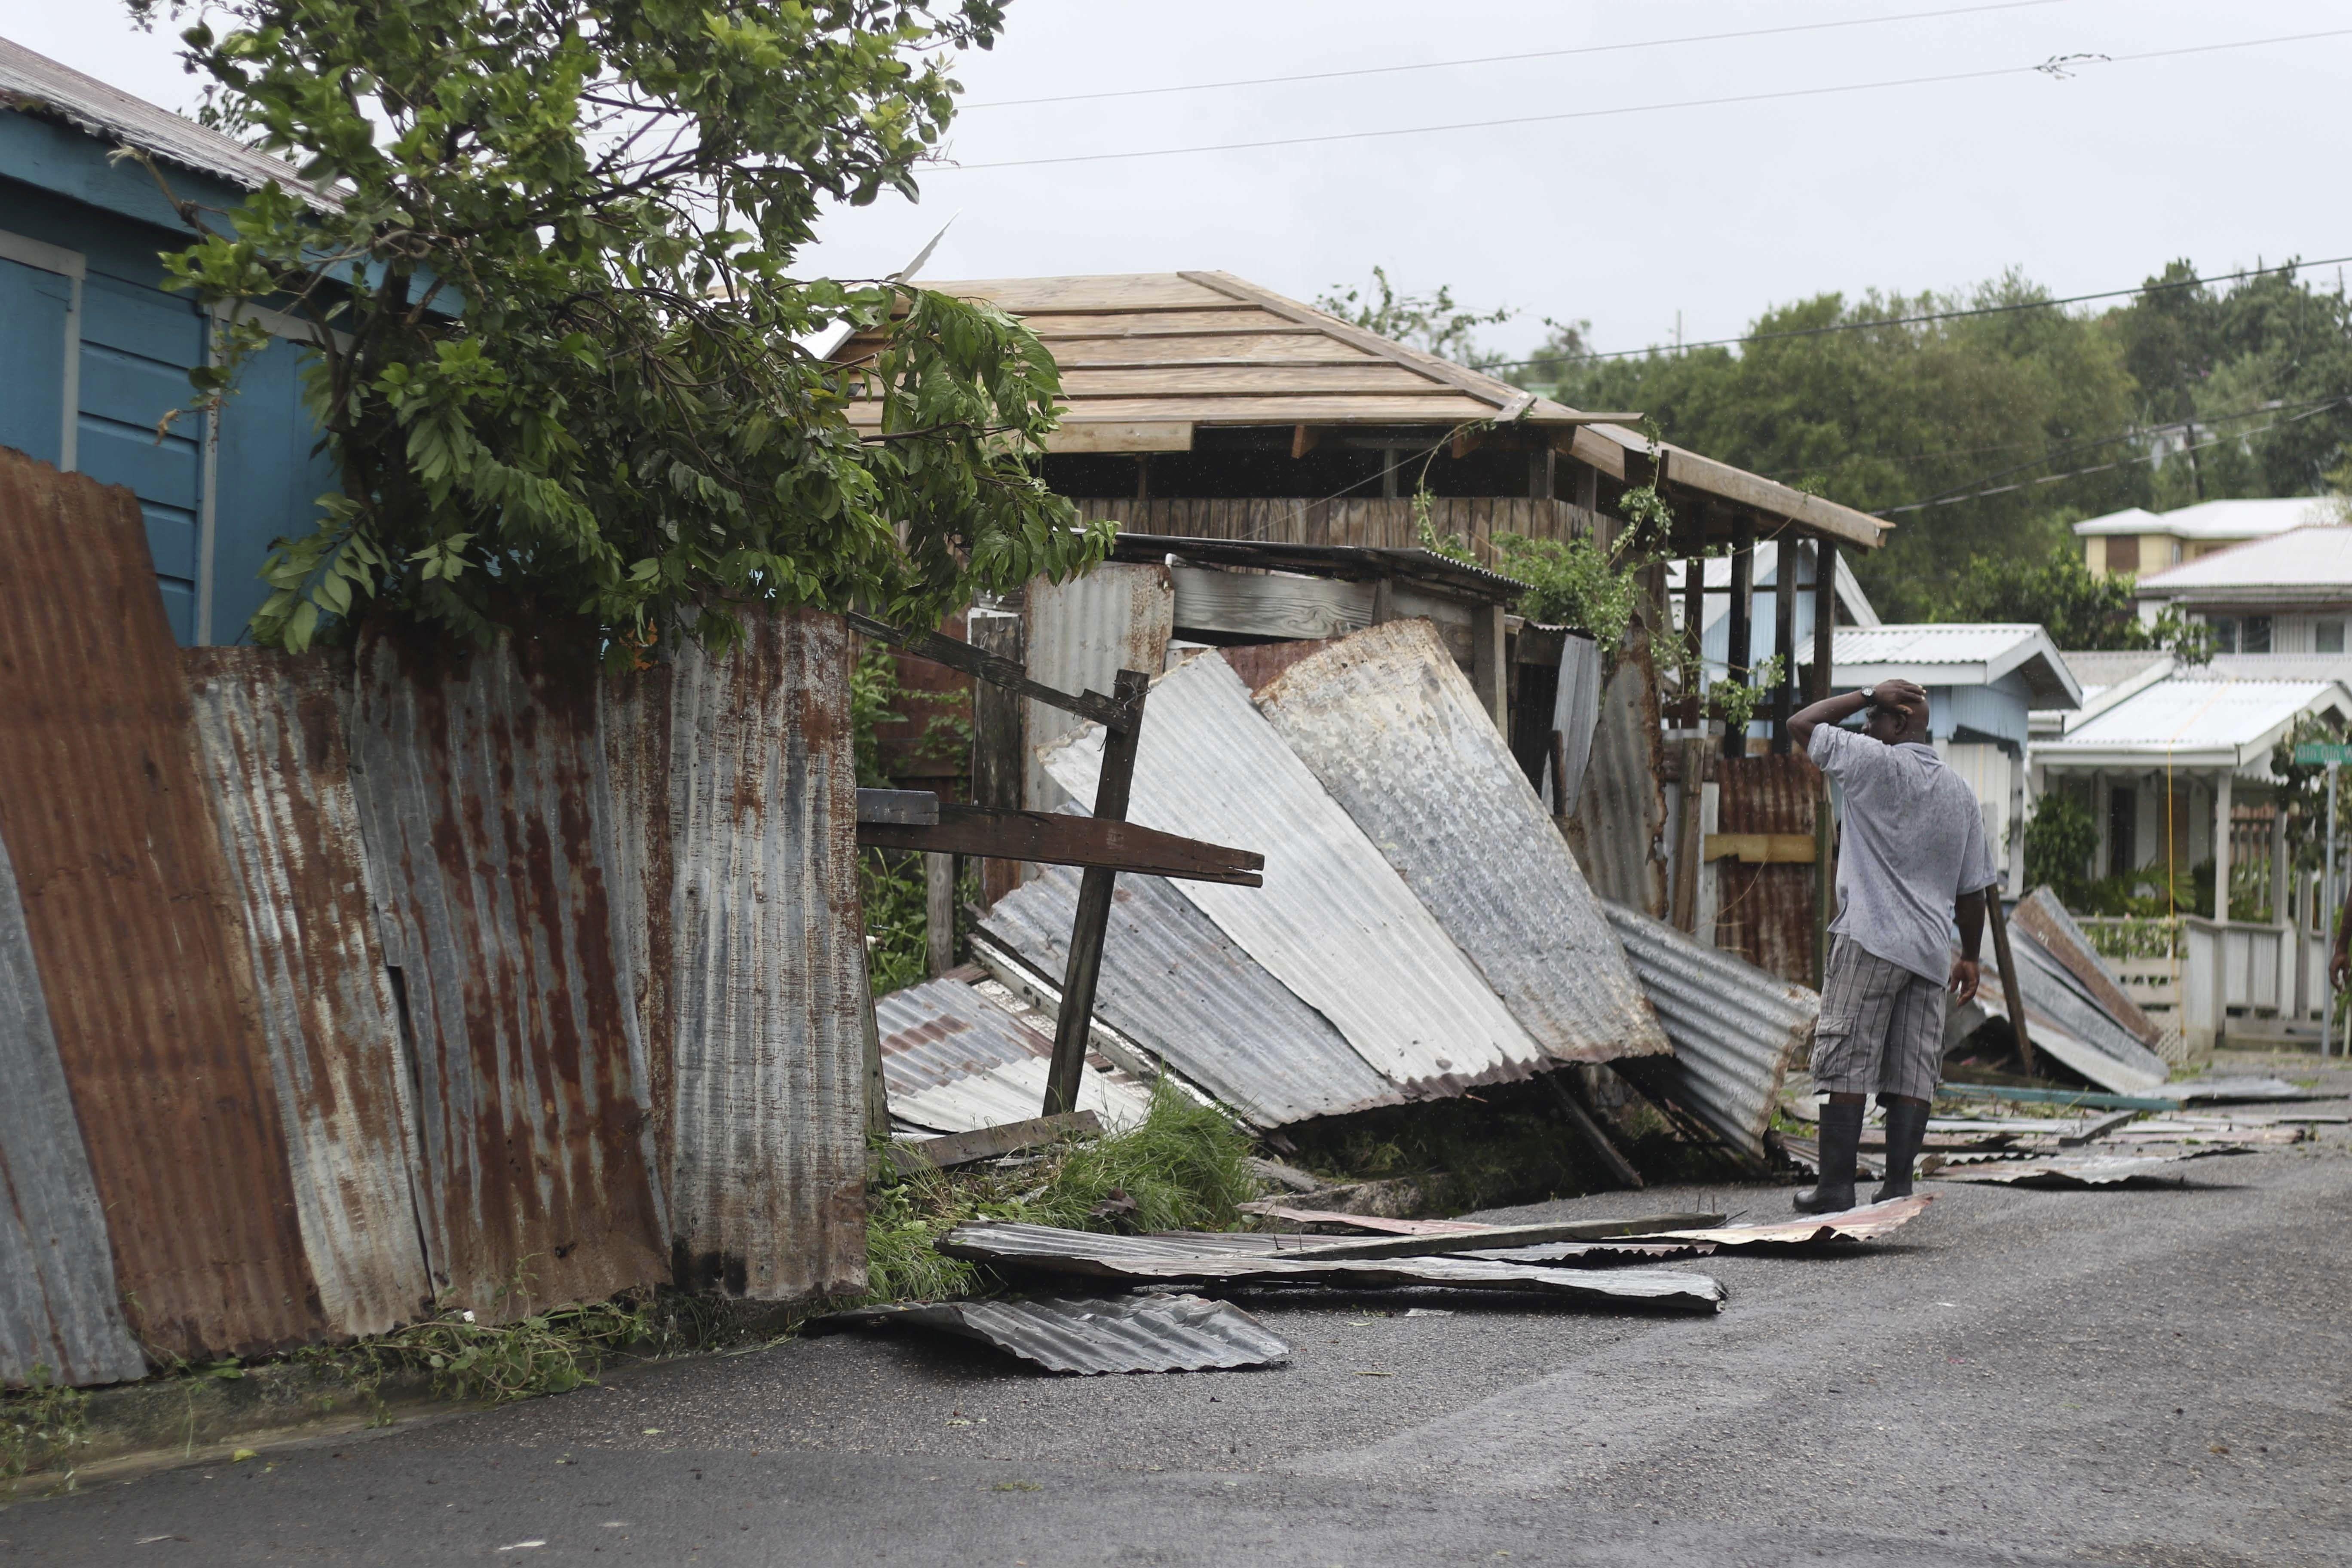 Hurricane Irma Devastated The Island Of Barbuda Caribbean Island Port Of Spain